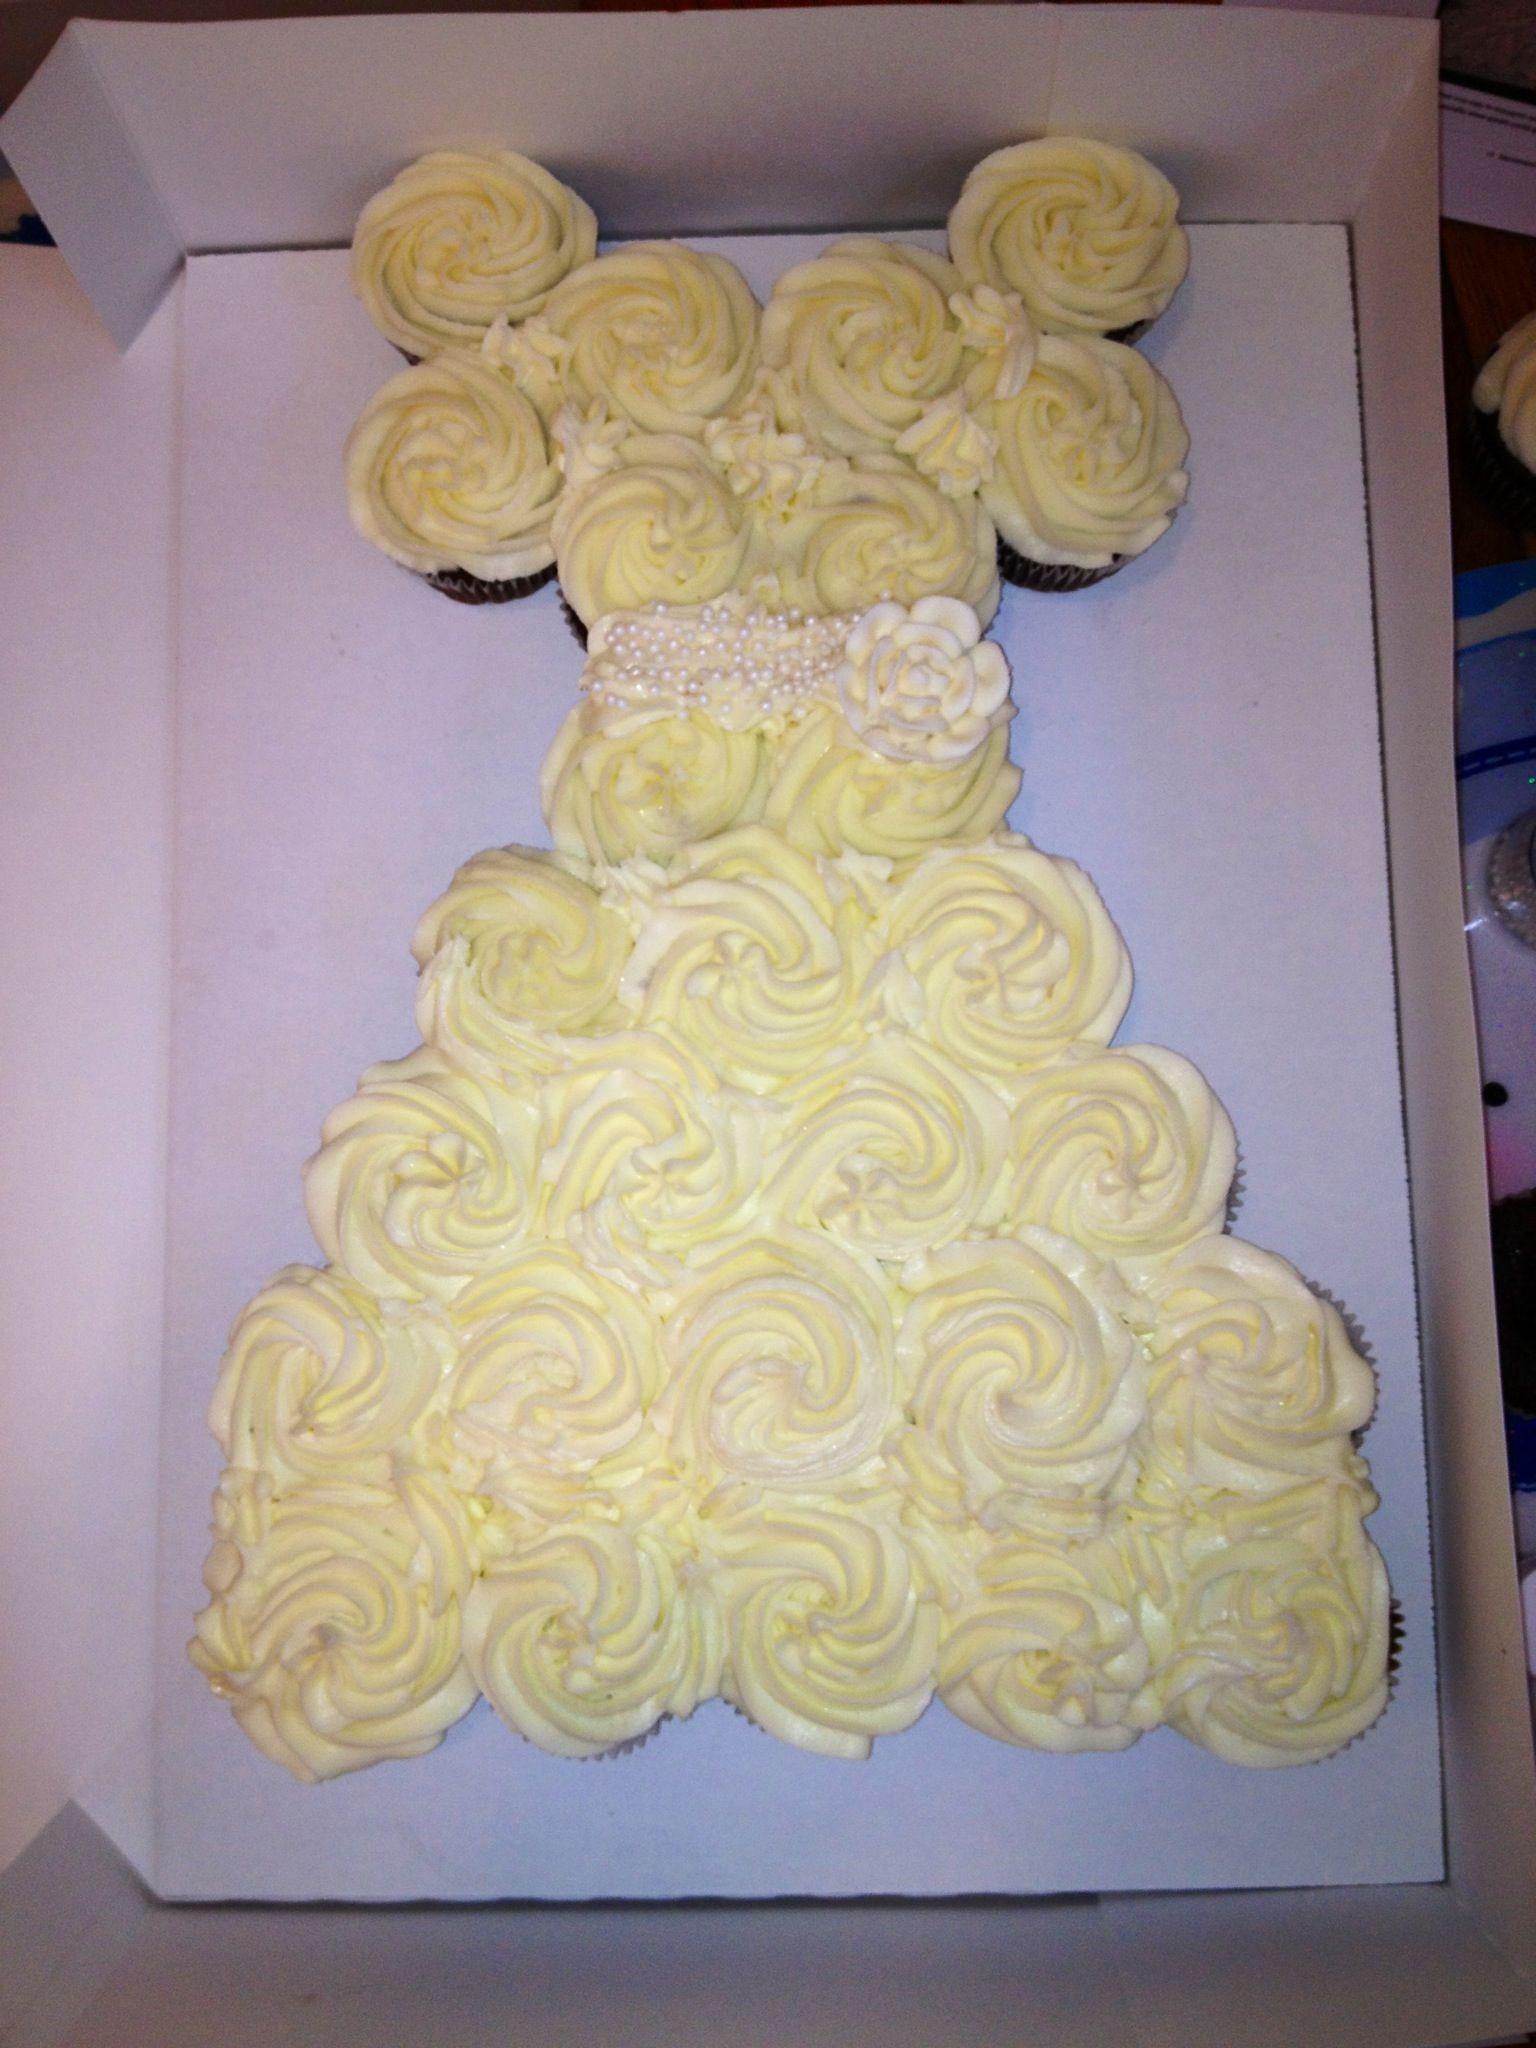 Pull apart wedding shower cupcakes ac plished my